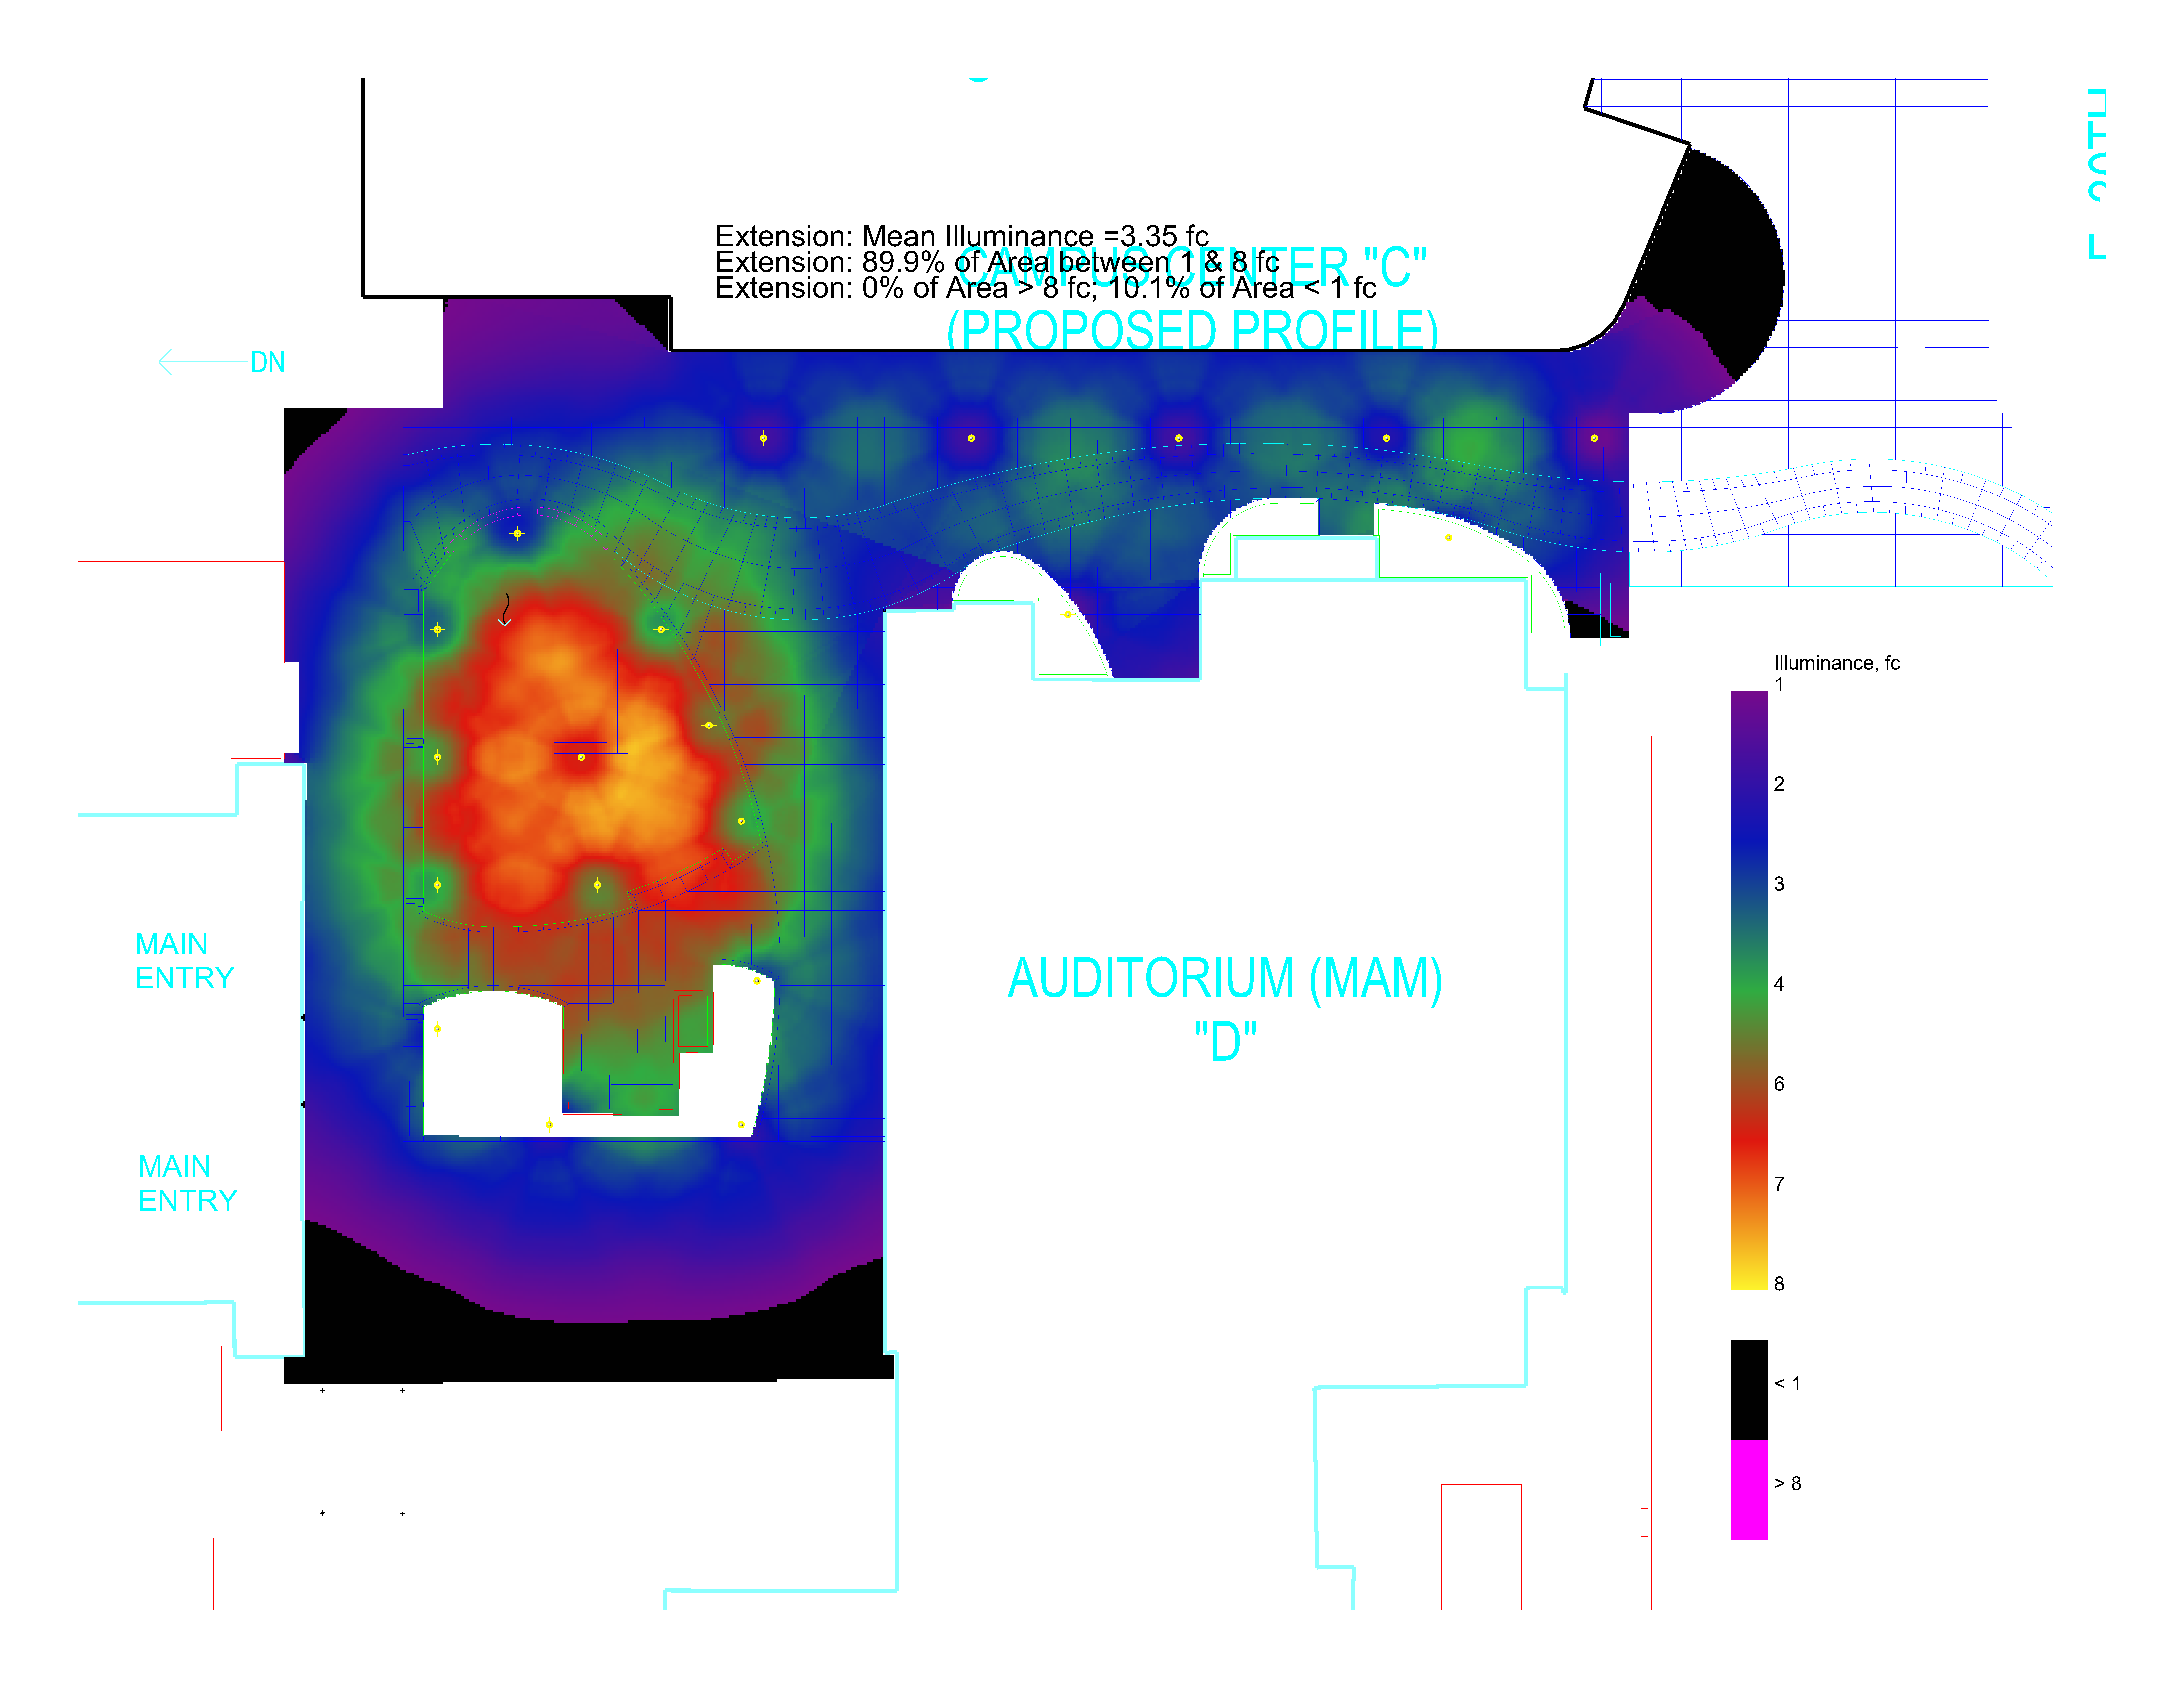 Photometric SE Extension 1-8fc (1)